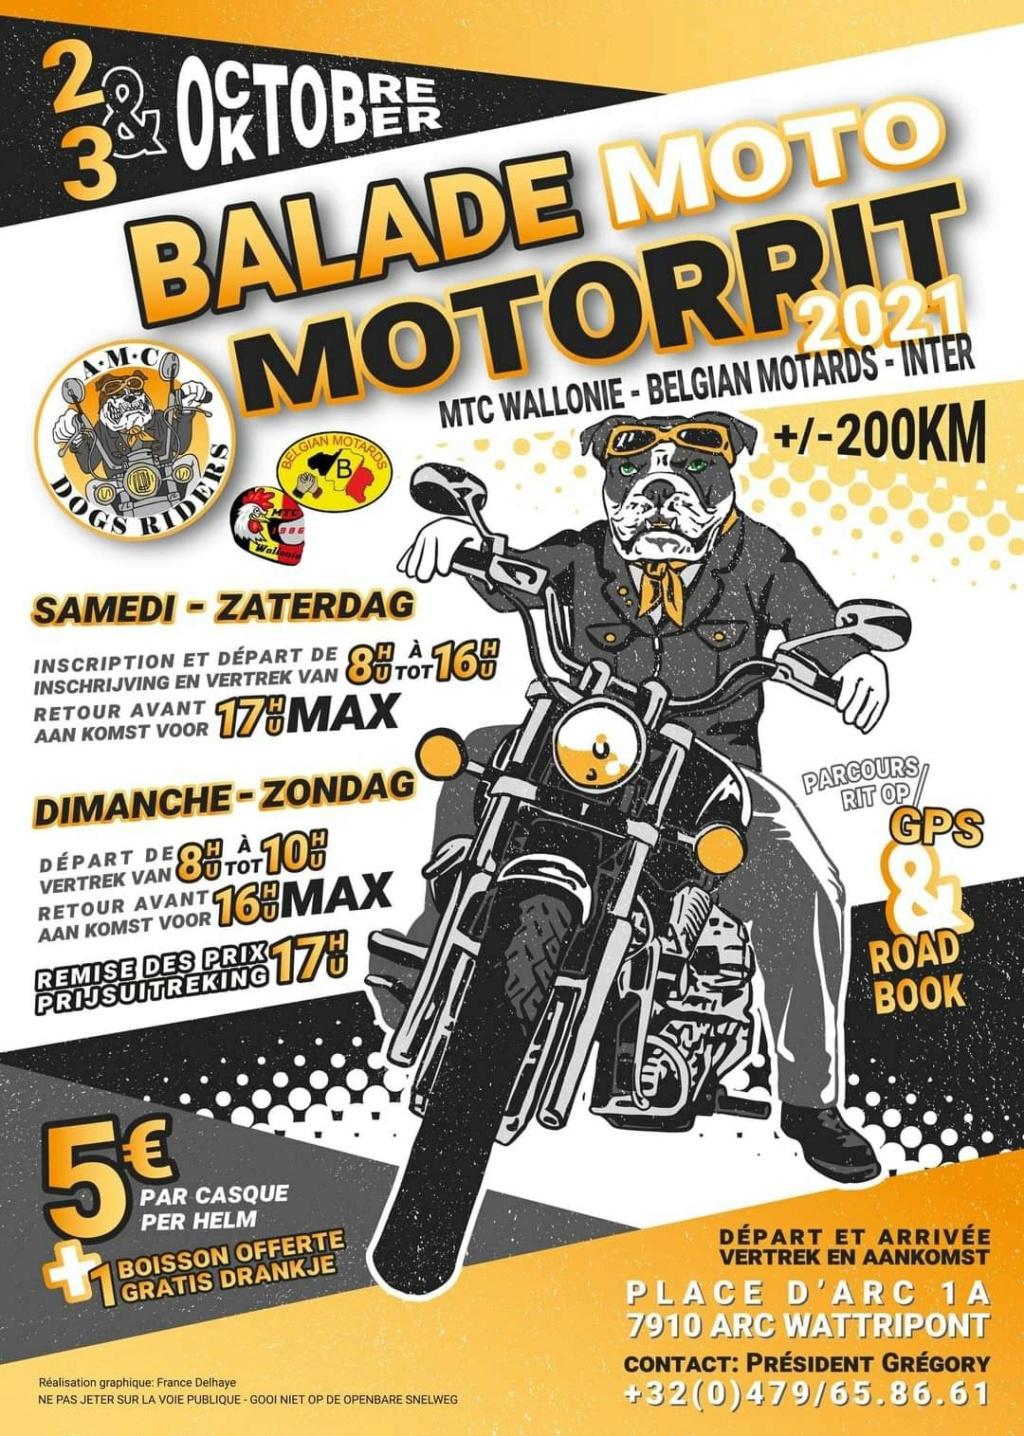 MANIFESTATION - Balade Moto MOTORRIT 2021 -  2 & 3 Octobre 2021 - Arc Wattripont (7910) BELGIQUE  24045010